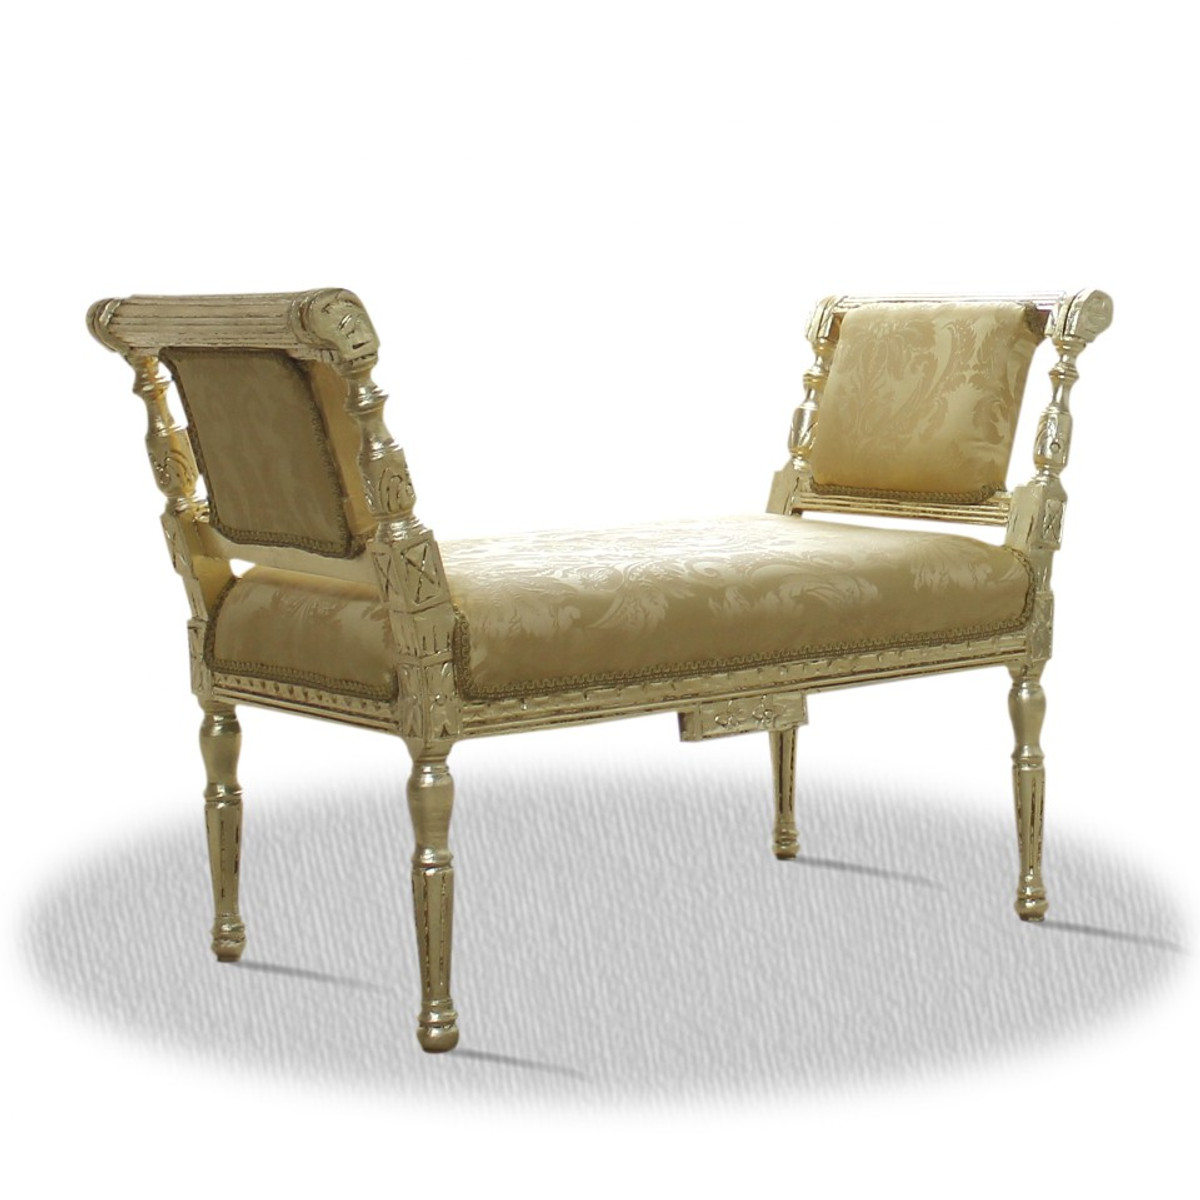 casa padrino barock sitzbank gold muster 110 x 40 x h 70 cm sitzb nke barock sitzb nke. Black Bedroom Furniture Sets. Home Design Ideas